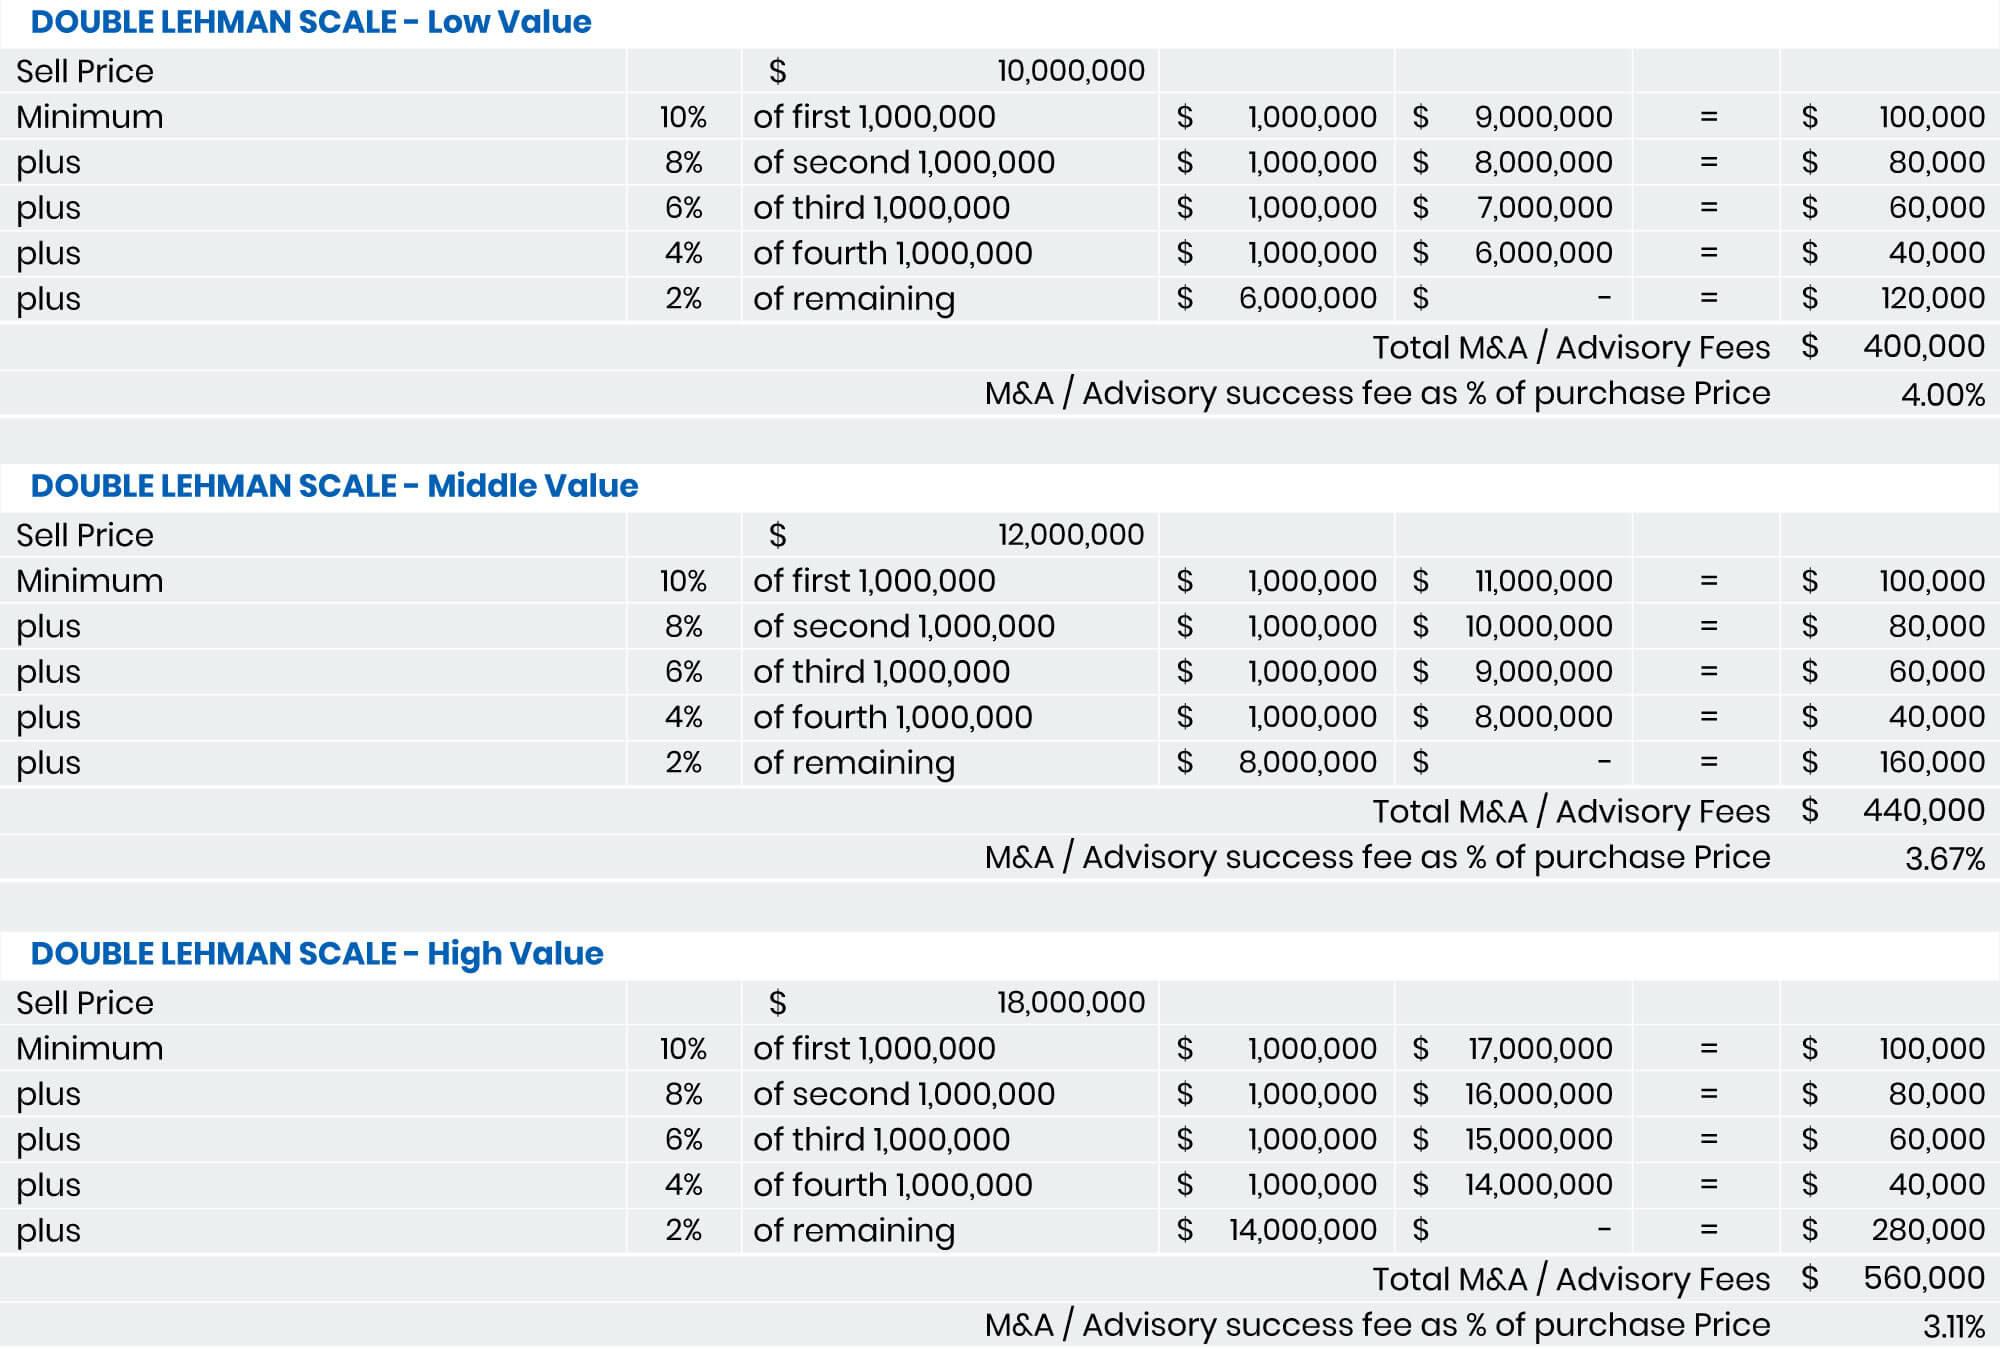 M&A advisory fees